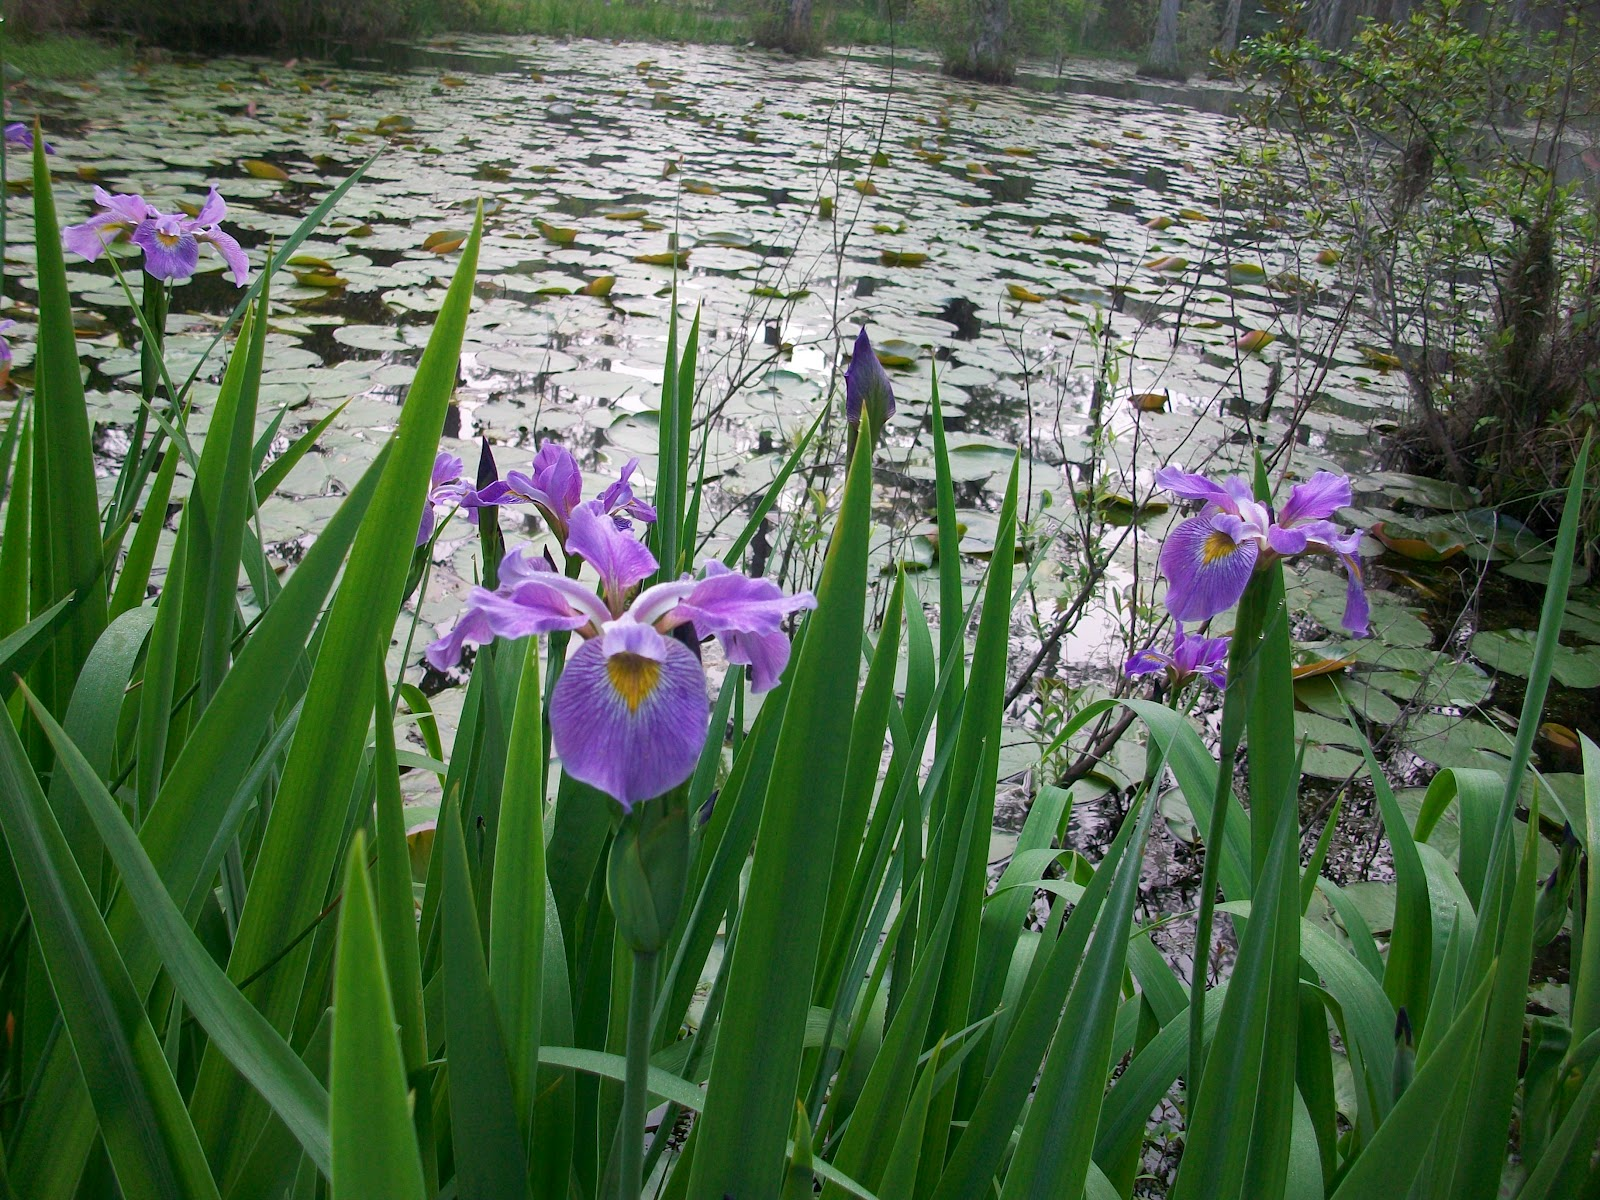 cypress gardens the gardeners blog early iris bloom. Black Bedroom Furniture Sets. Home Design Ideas